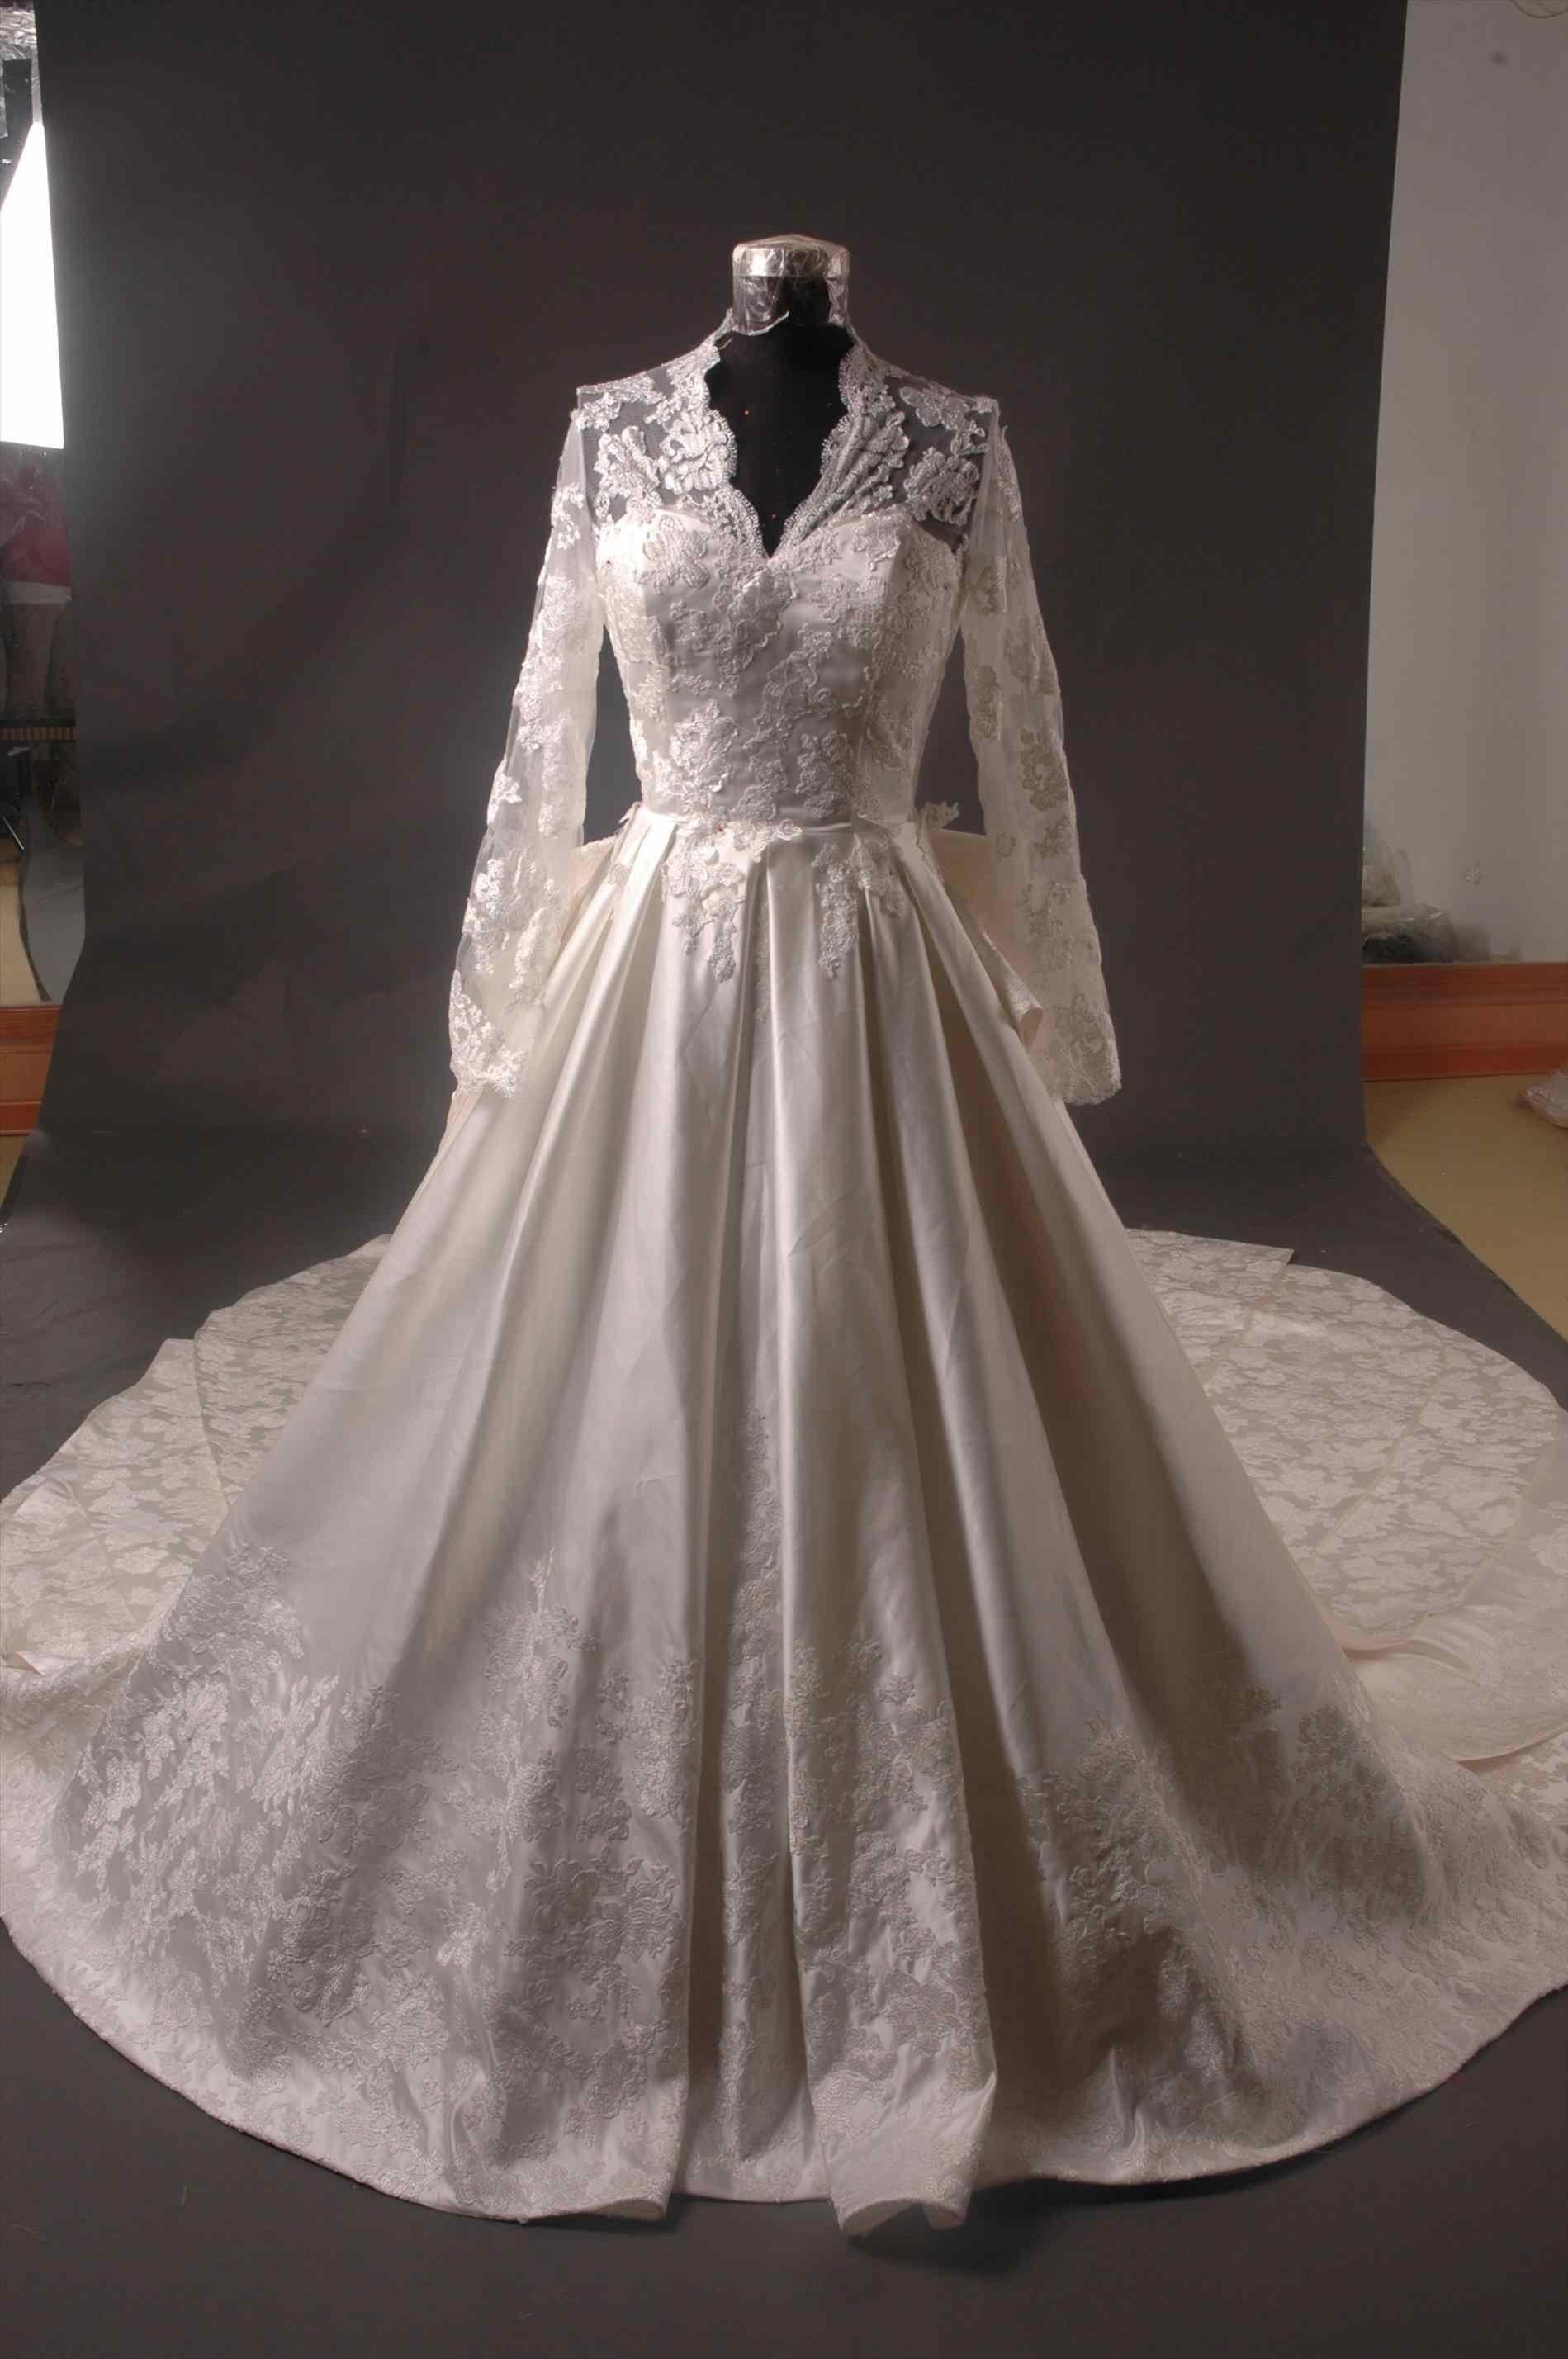 Gwen Stefani Hochzeitskleid  New Gwen Stefani Wedding Dress Replica AxiMedia